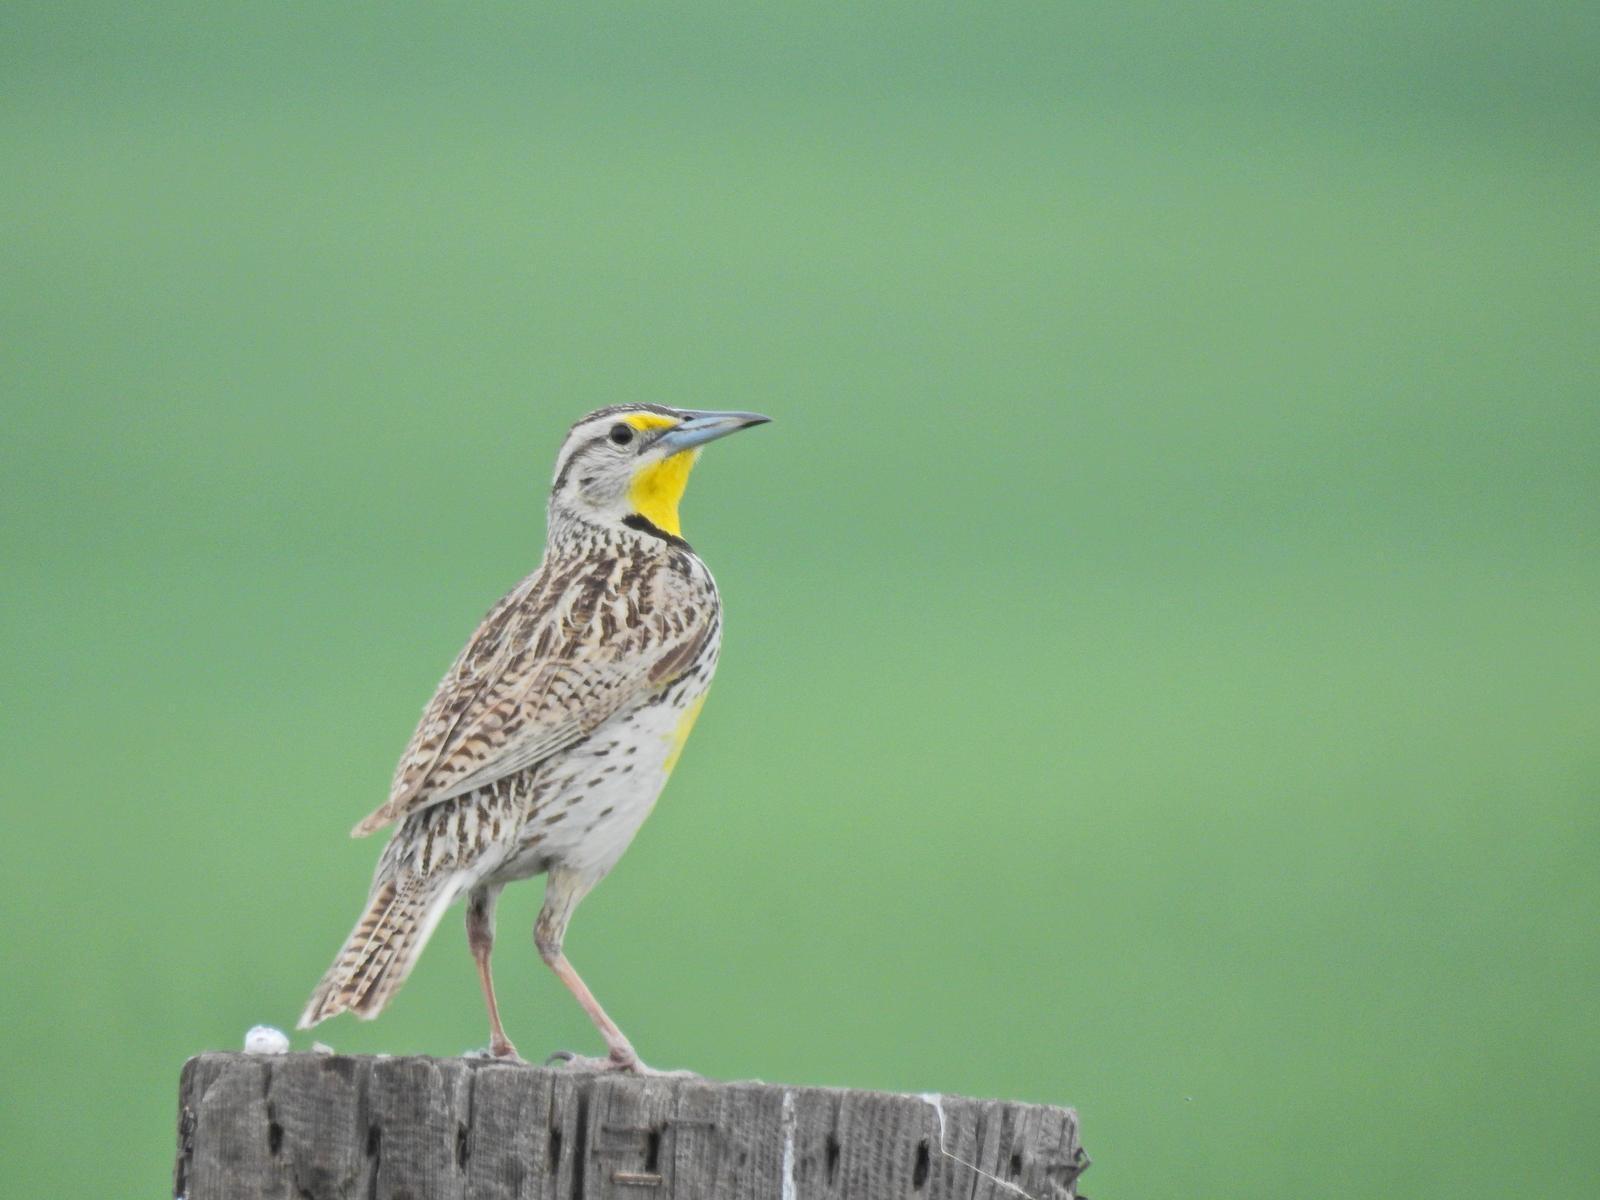 Western Meadowlark Photo by Enid Bachman